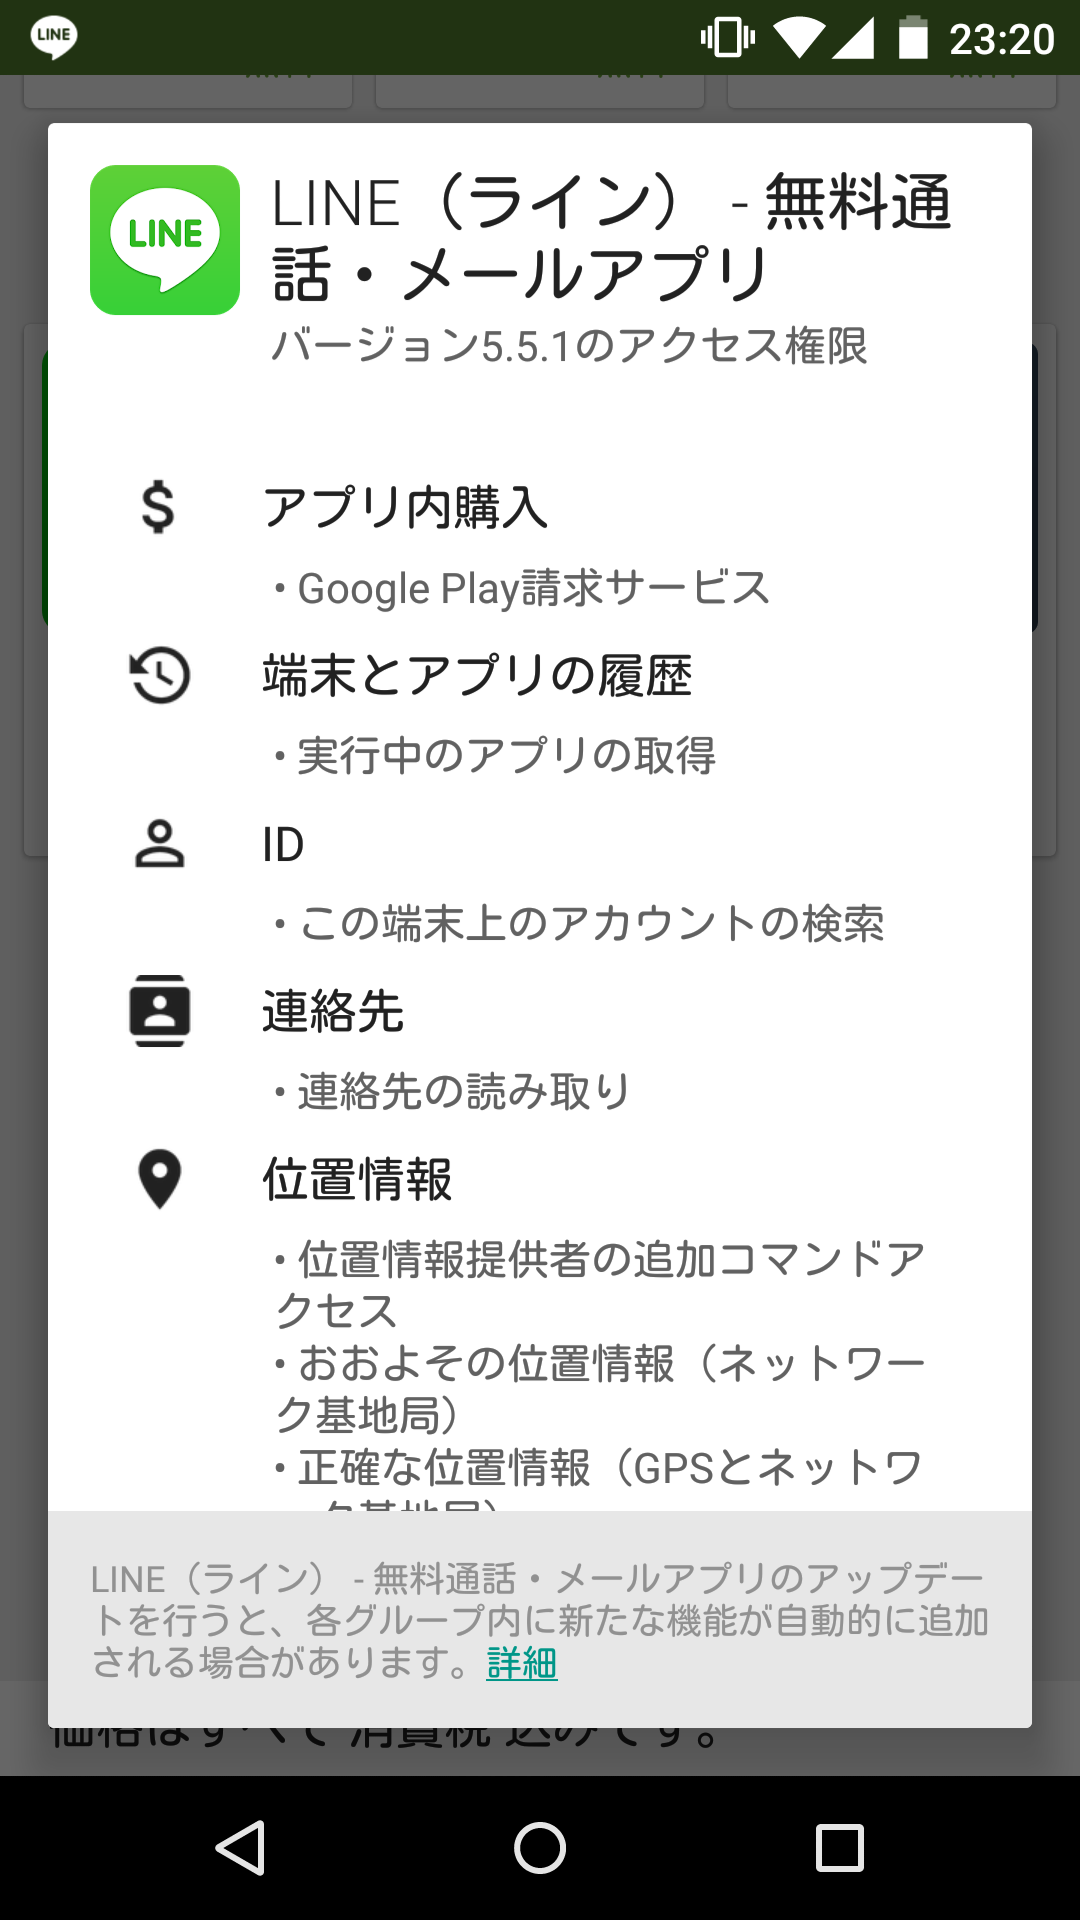 Screenshot_2015-10-11-23-20-40